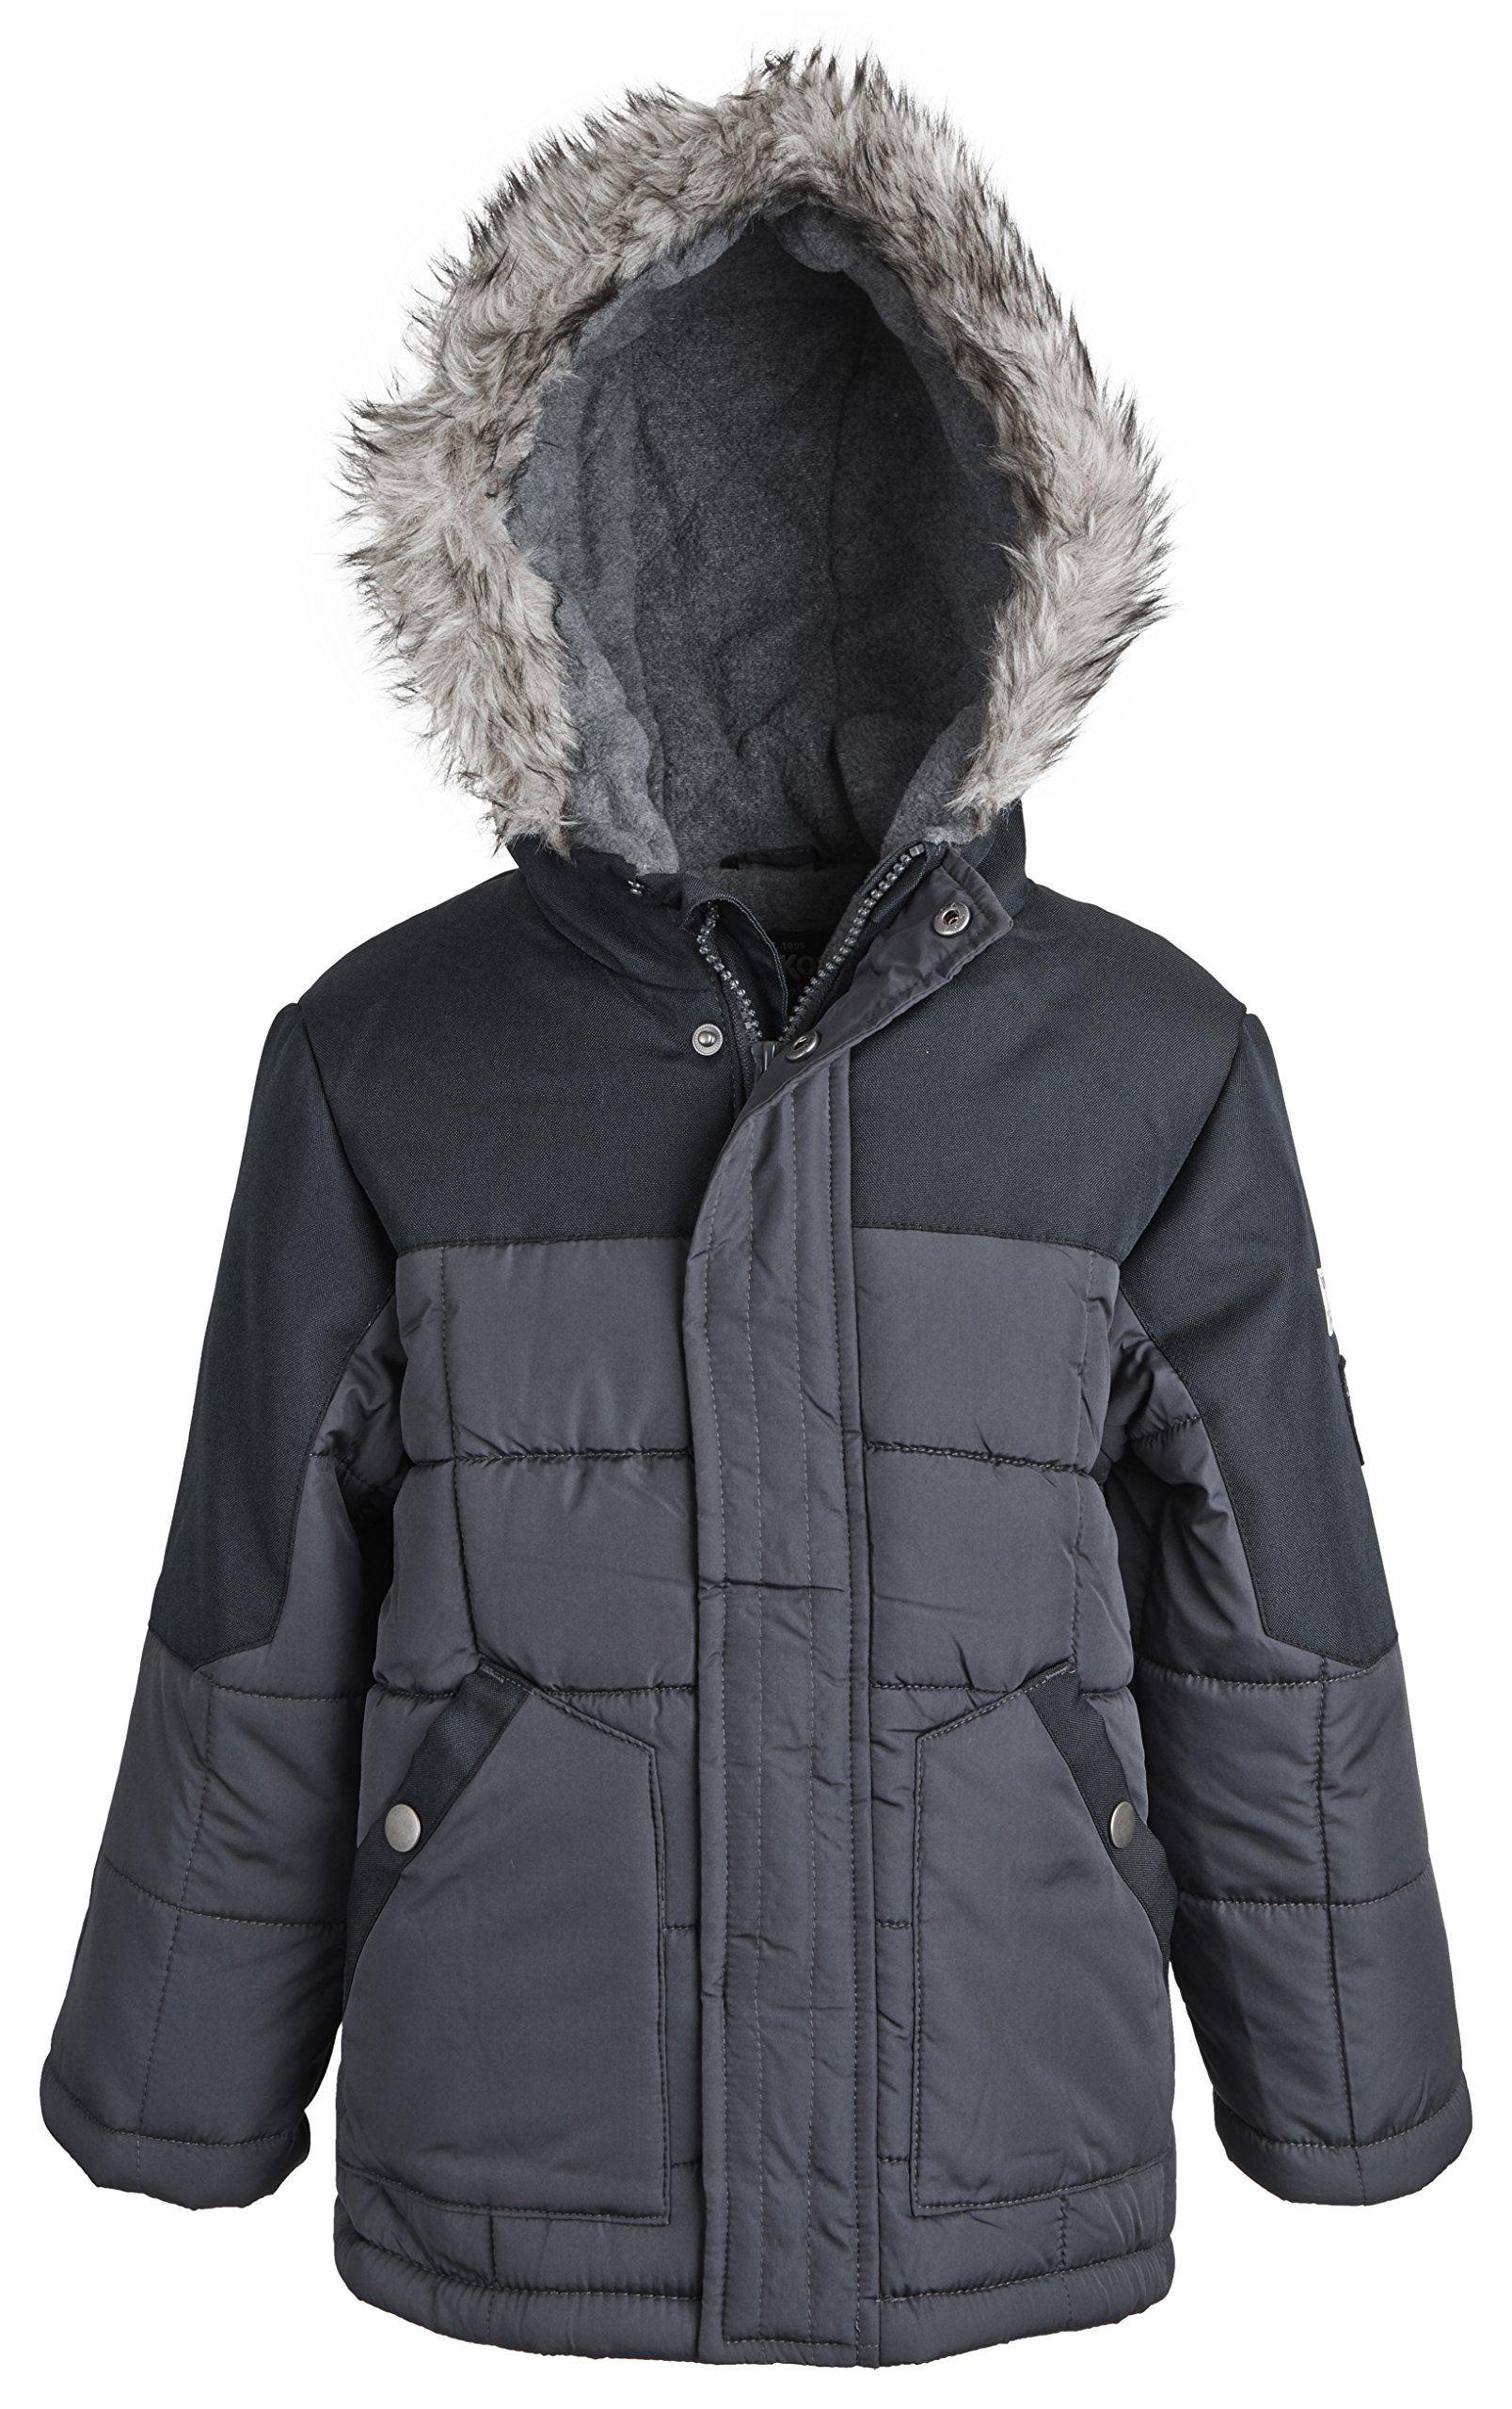 Osh Kosh Little Boys Quilted Winter Puffer Jacket With Fleece Lined Hood Black Size 5 6 Plush Fleece Lines The Winter Puffer Jackets Puffer Jackets Puffer [ 2560 x 1607 Pixel ]